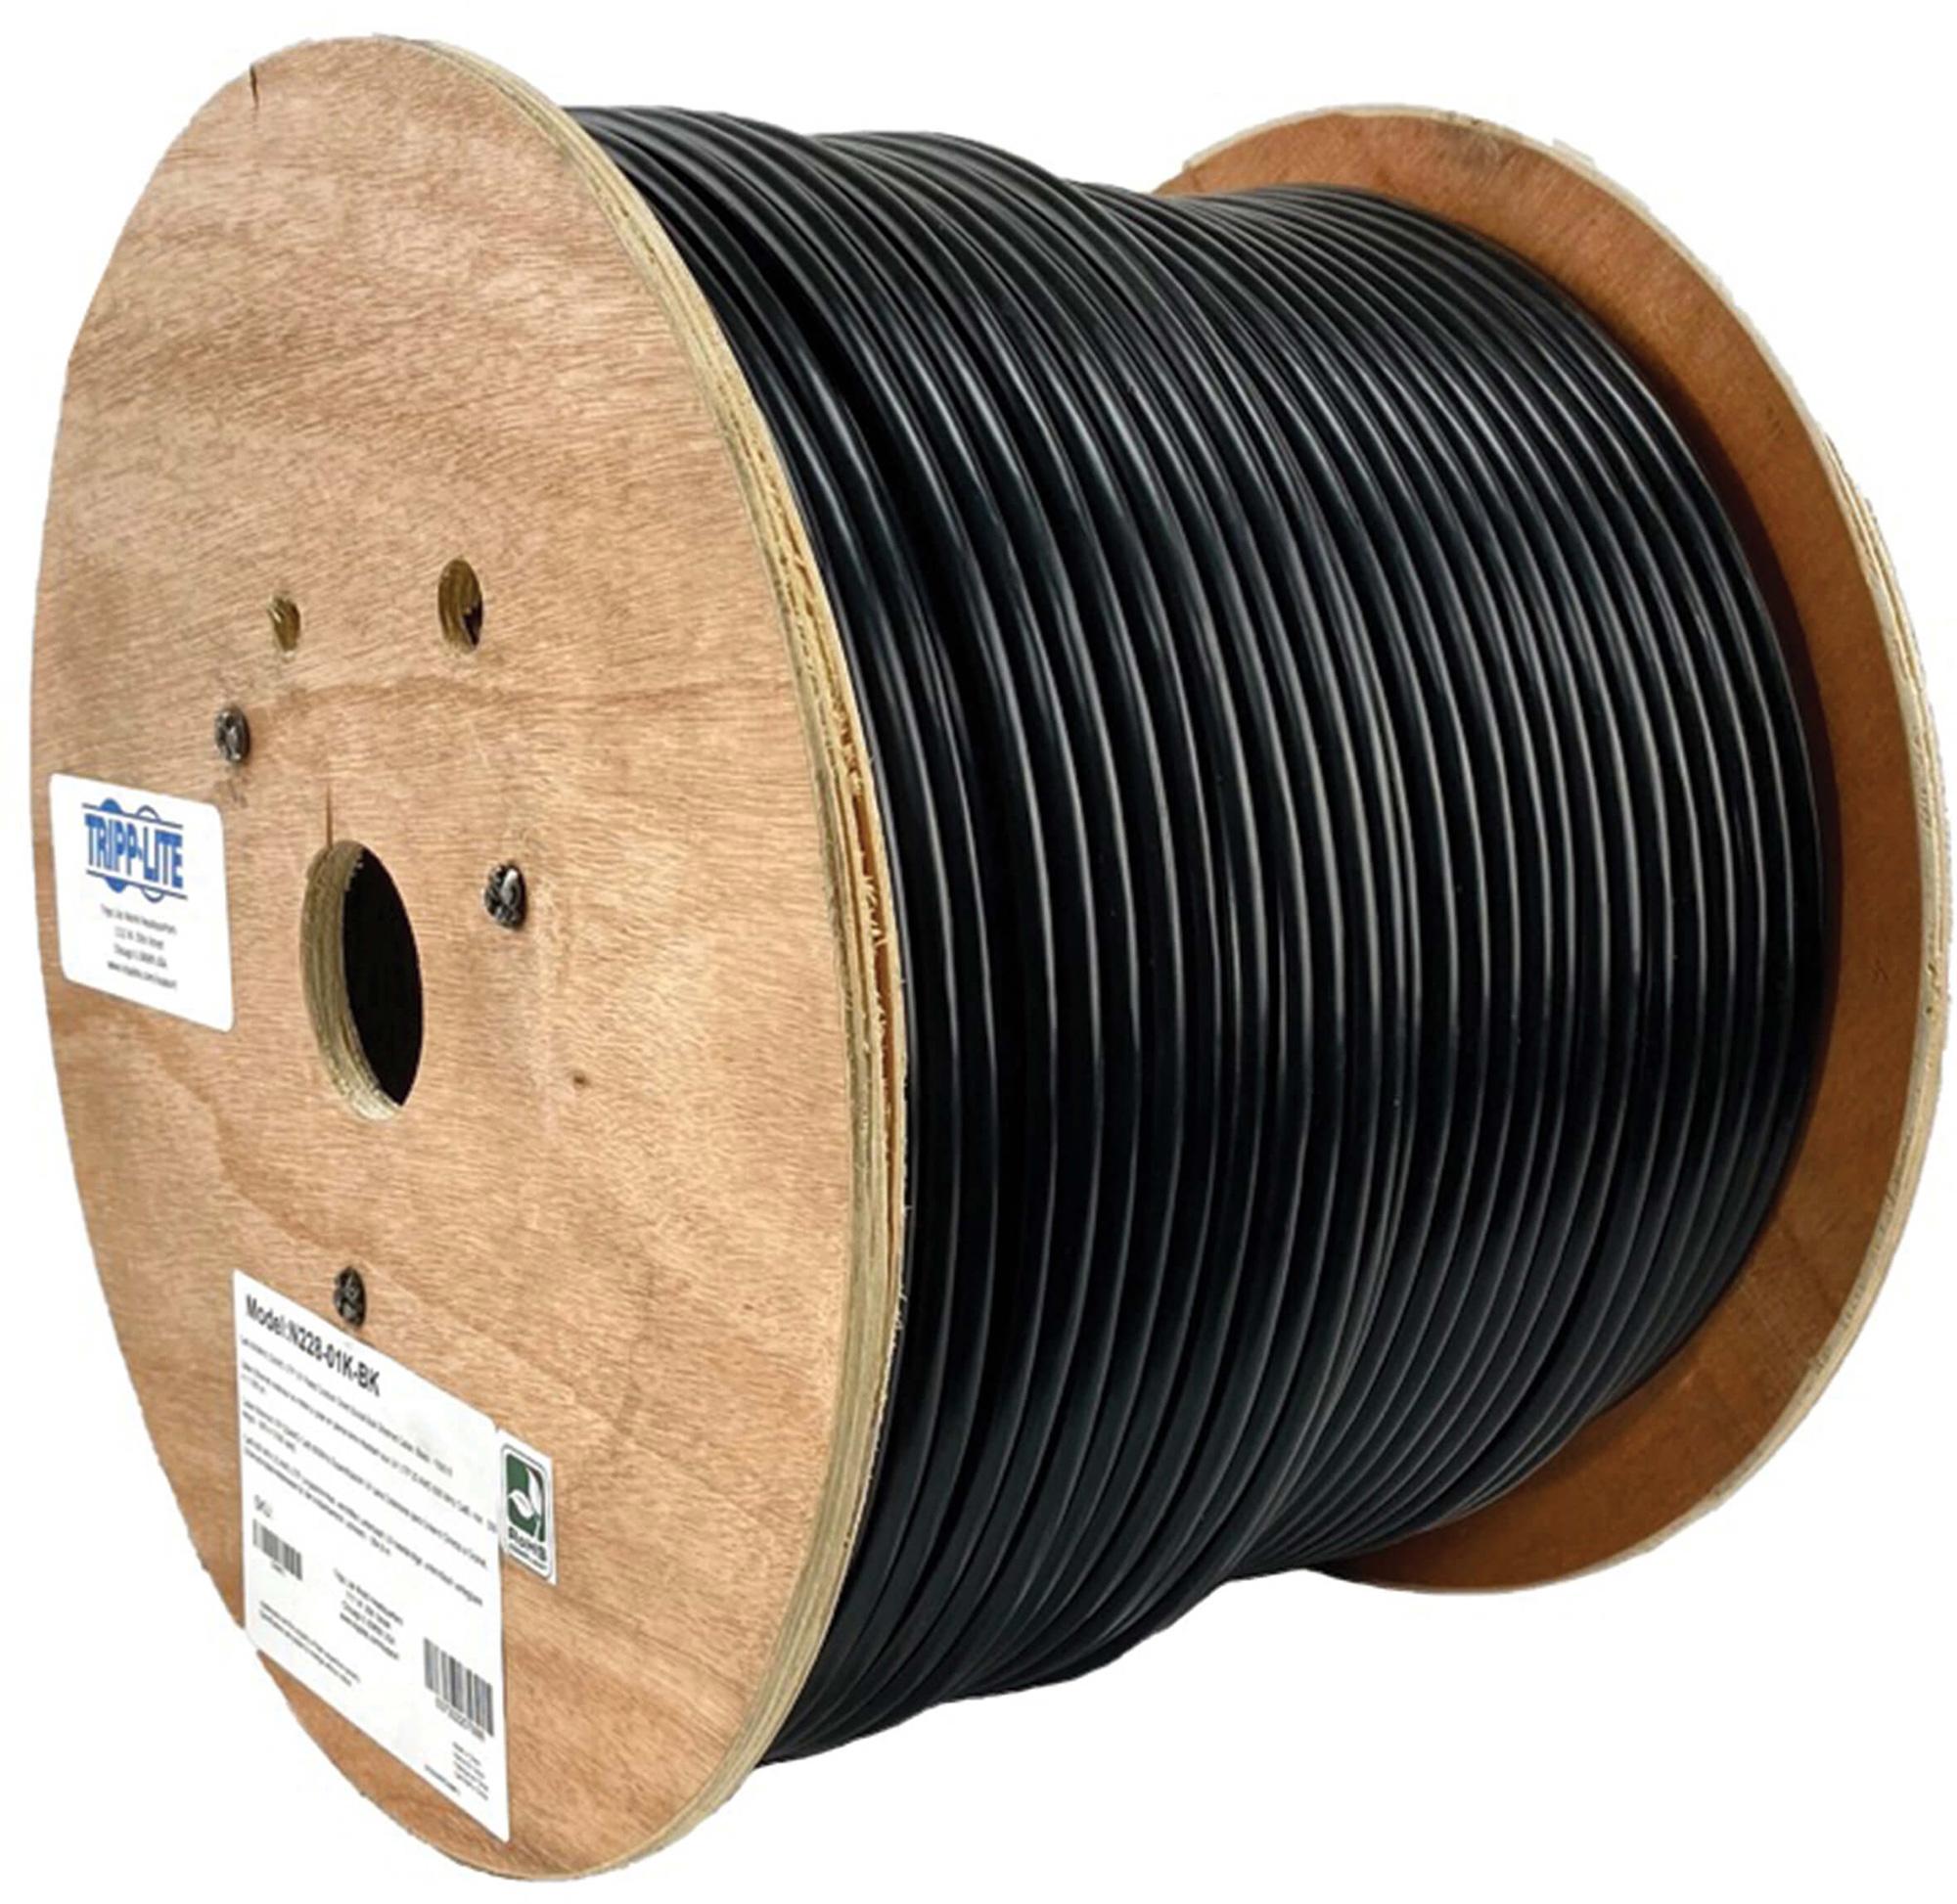 Tripp Lite N228-01K-BK Cat6/Cat6e Bulk Ethernet Cable 600MHz Outdoor-Rated - Black - 1000 Foot TRL-N228-01K-BK